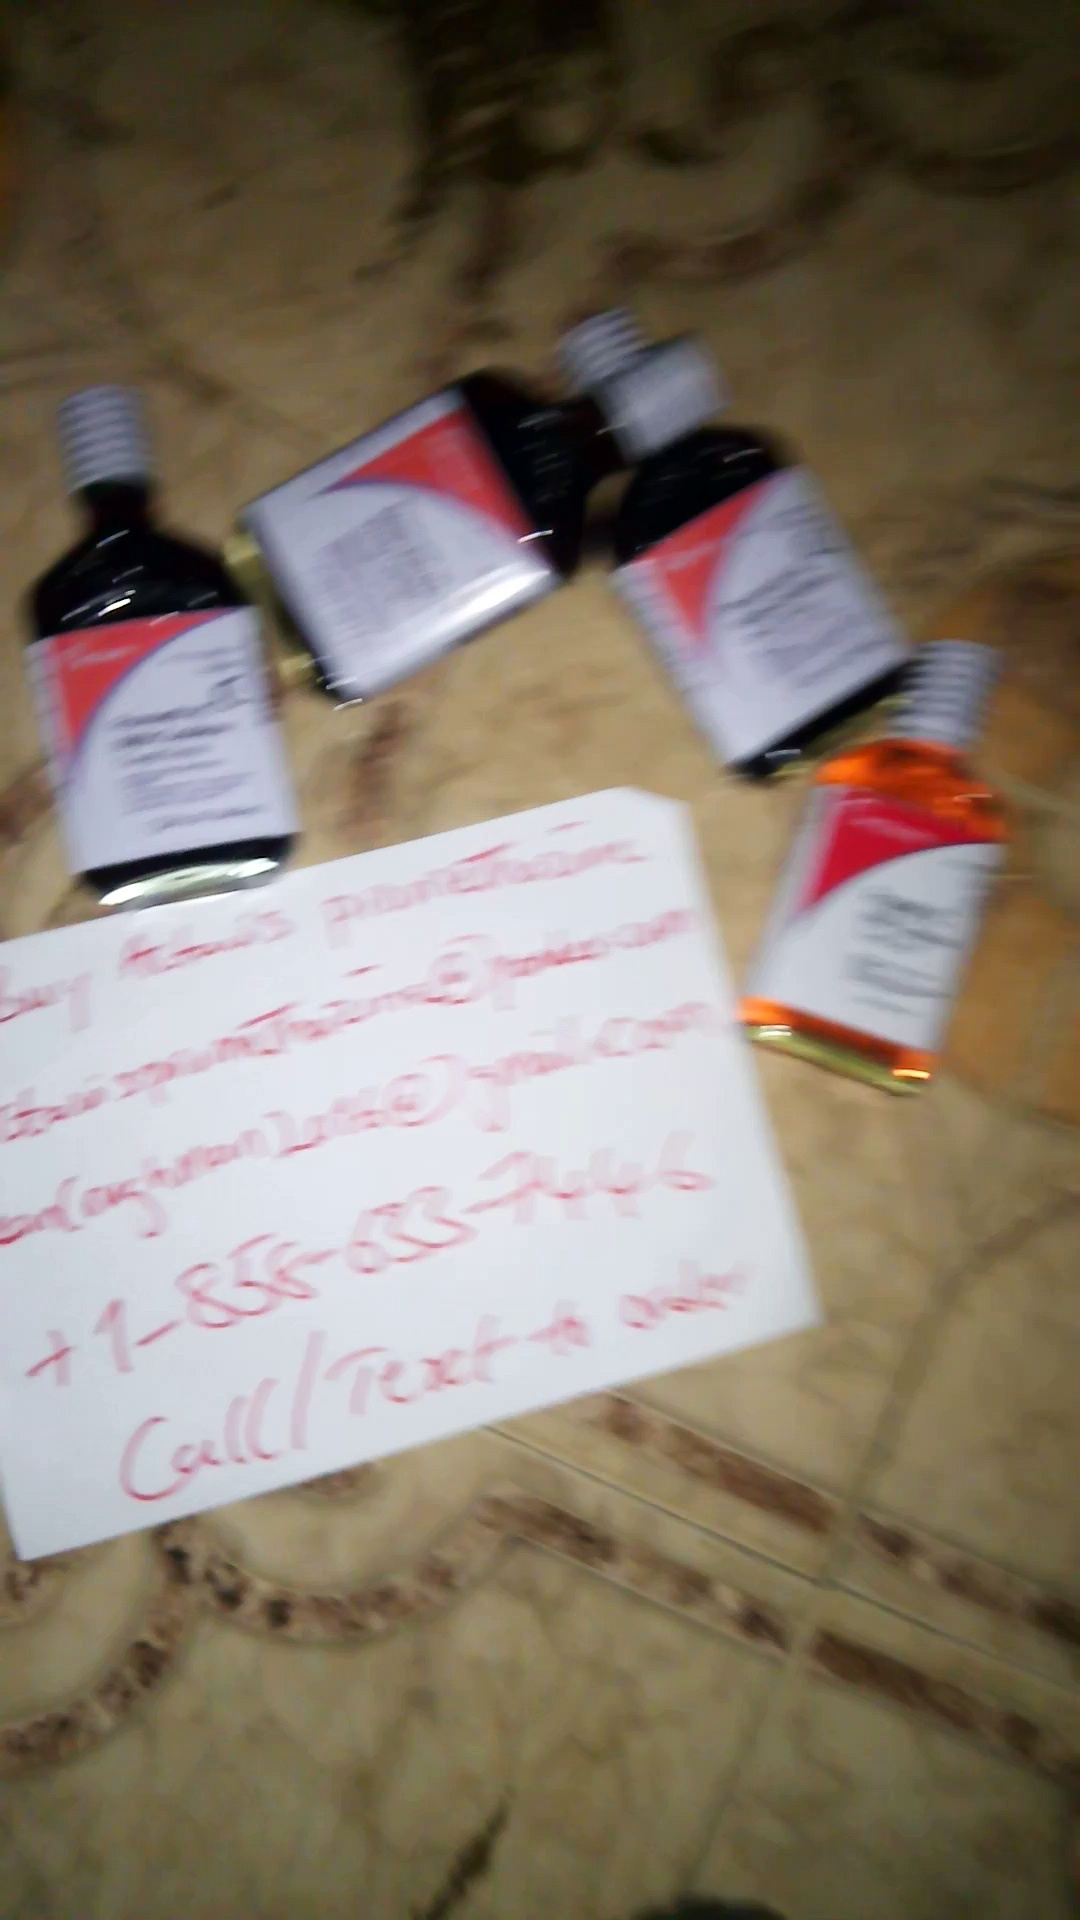 Buy Actavis Cough Syrup Purple 8oz, 16oz, 32oz pints bottles GA Atlanta